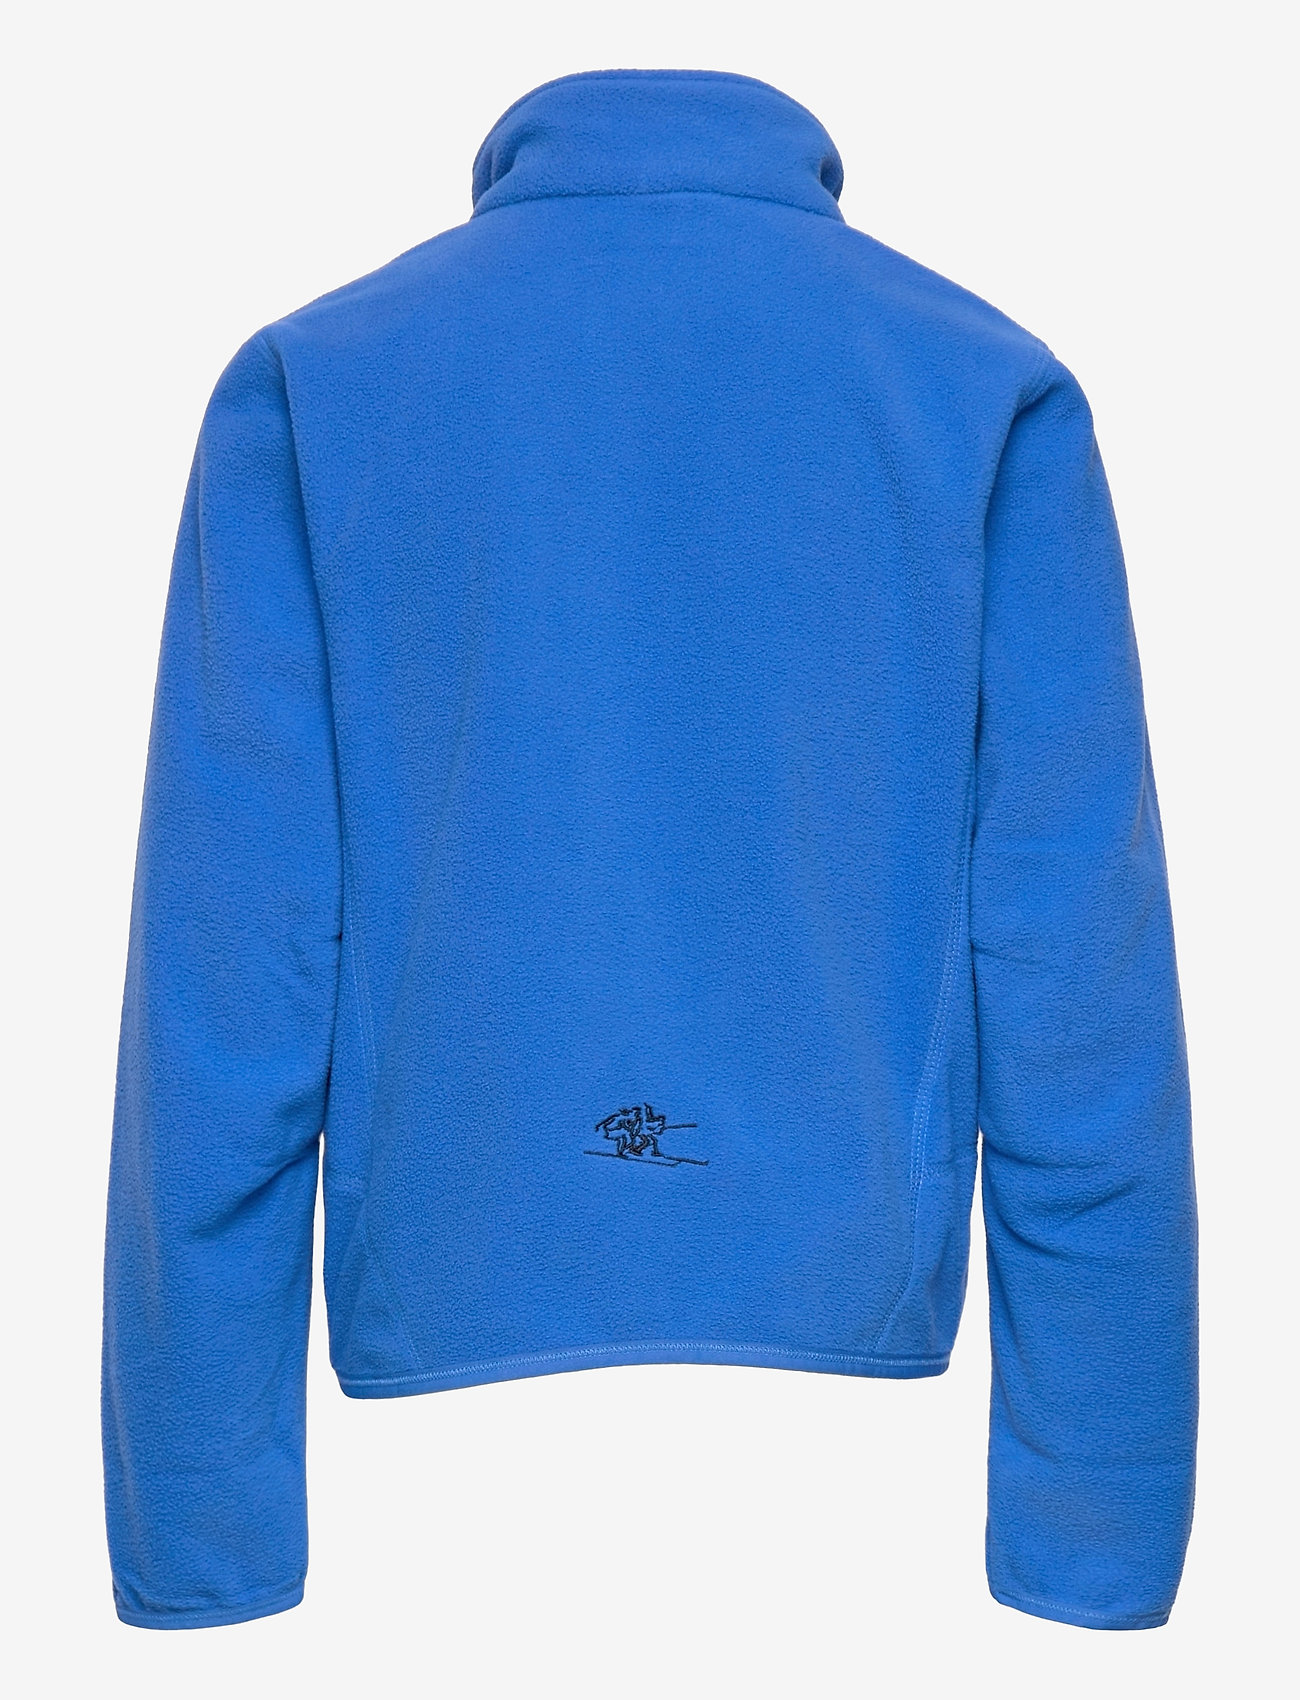 Bergans - Runde Youth Jkt - isolerede jakker - strong blue / navy - 1